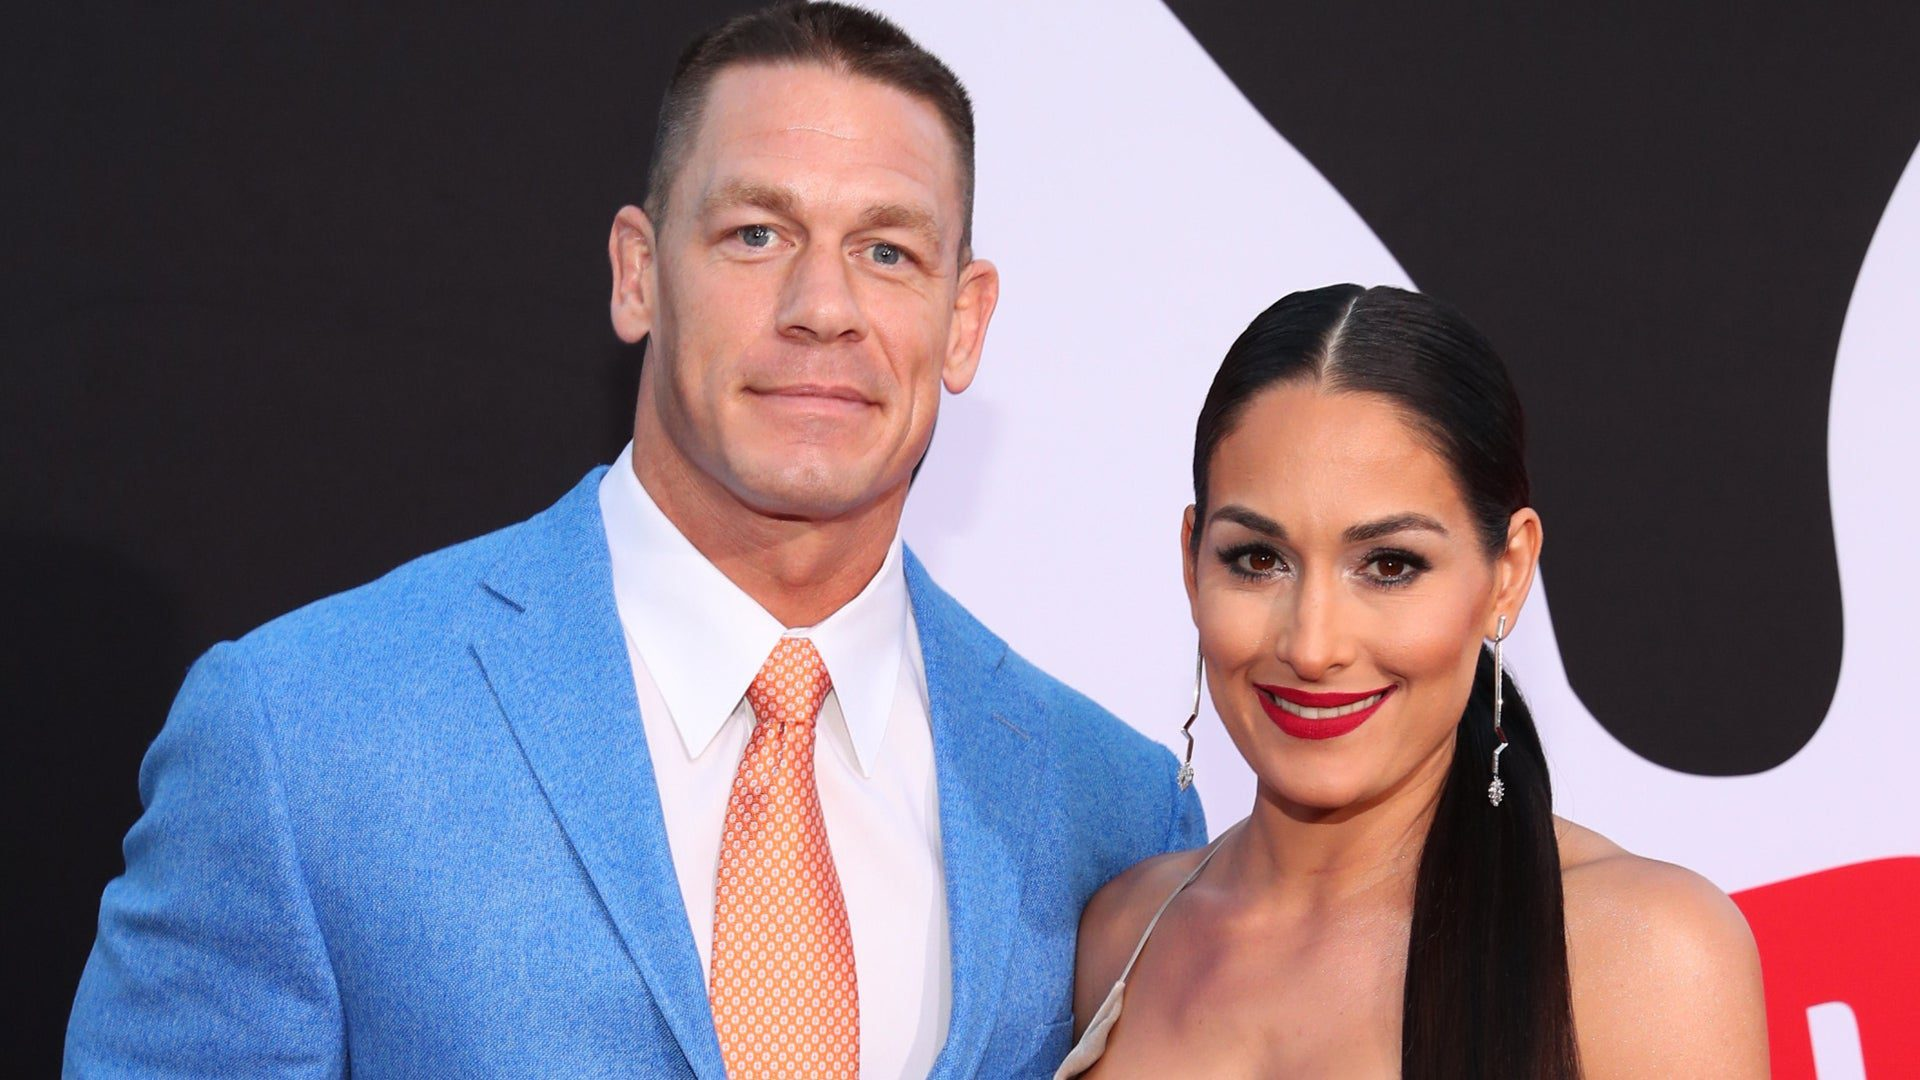 John Cena Girlfriend